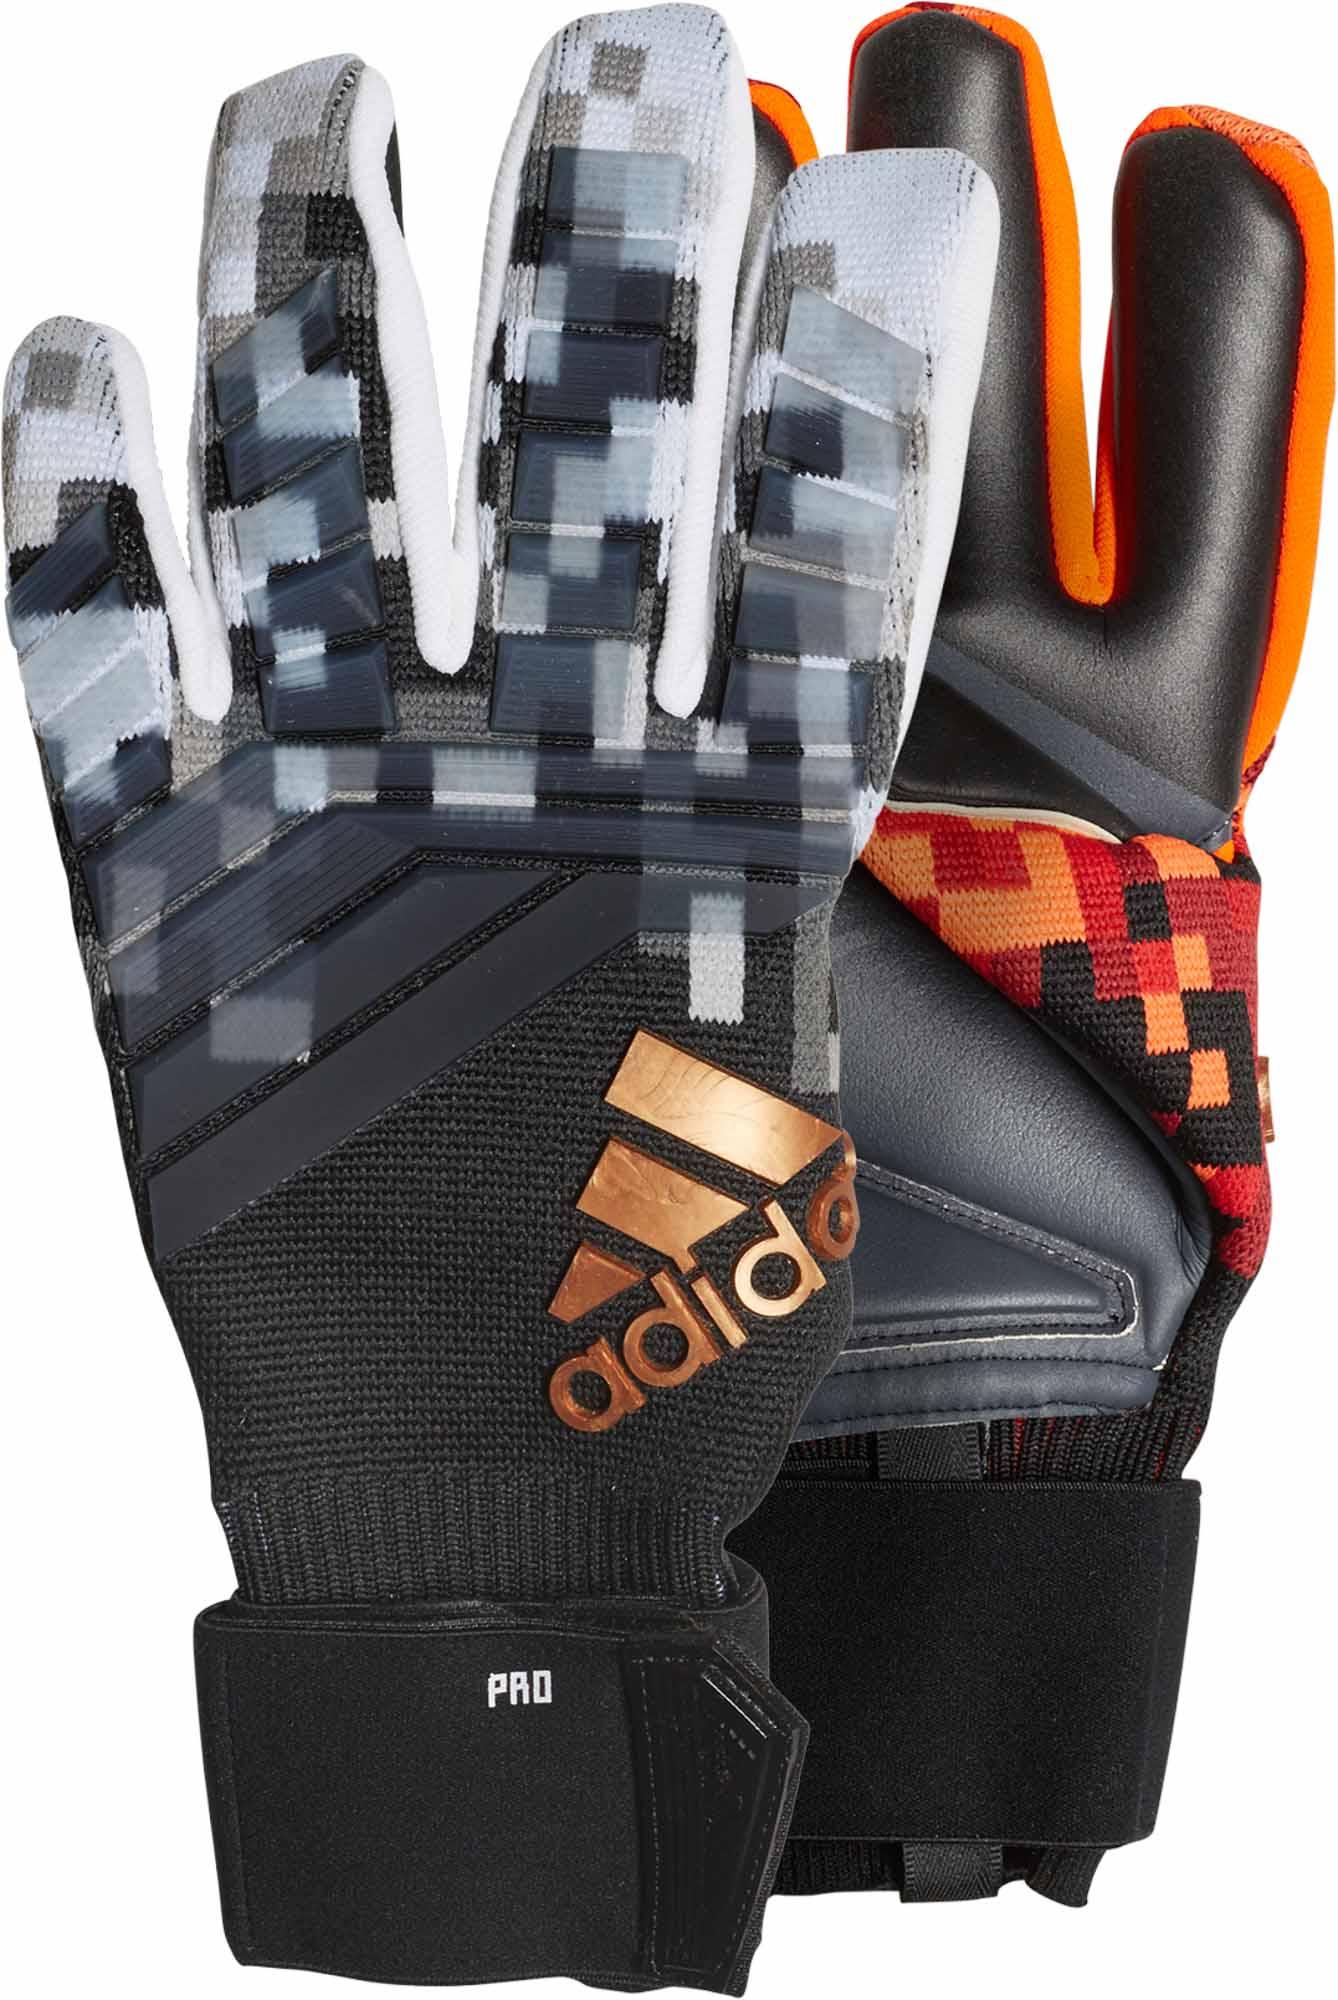 1645e0ec5157 adidas Predator World Cup Goalkeeper Gloves - Red/Black - SoccerPro